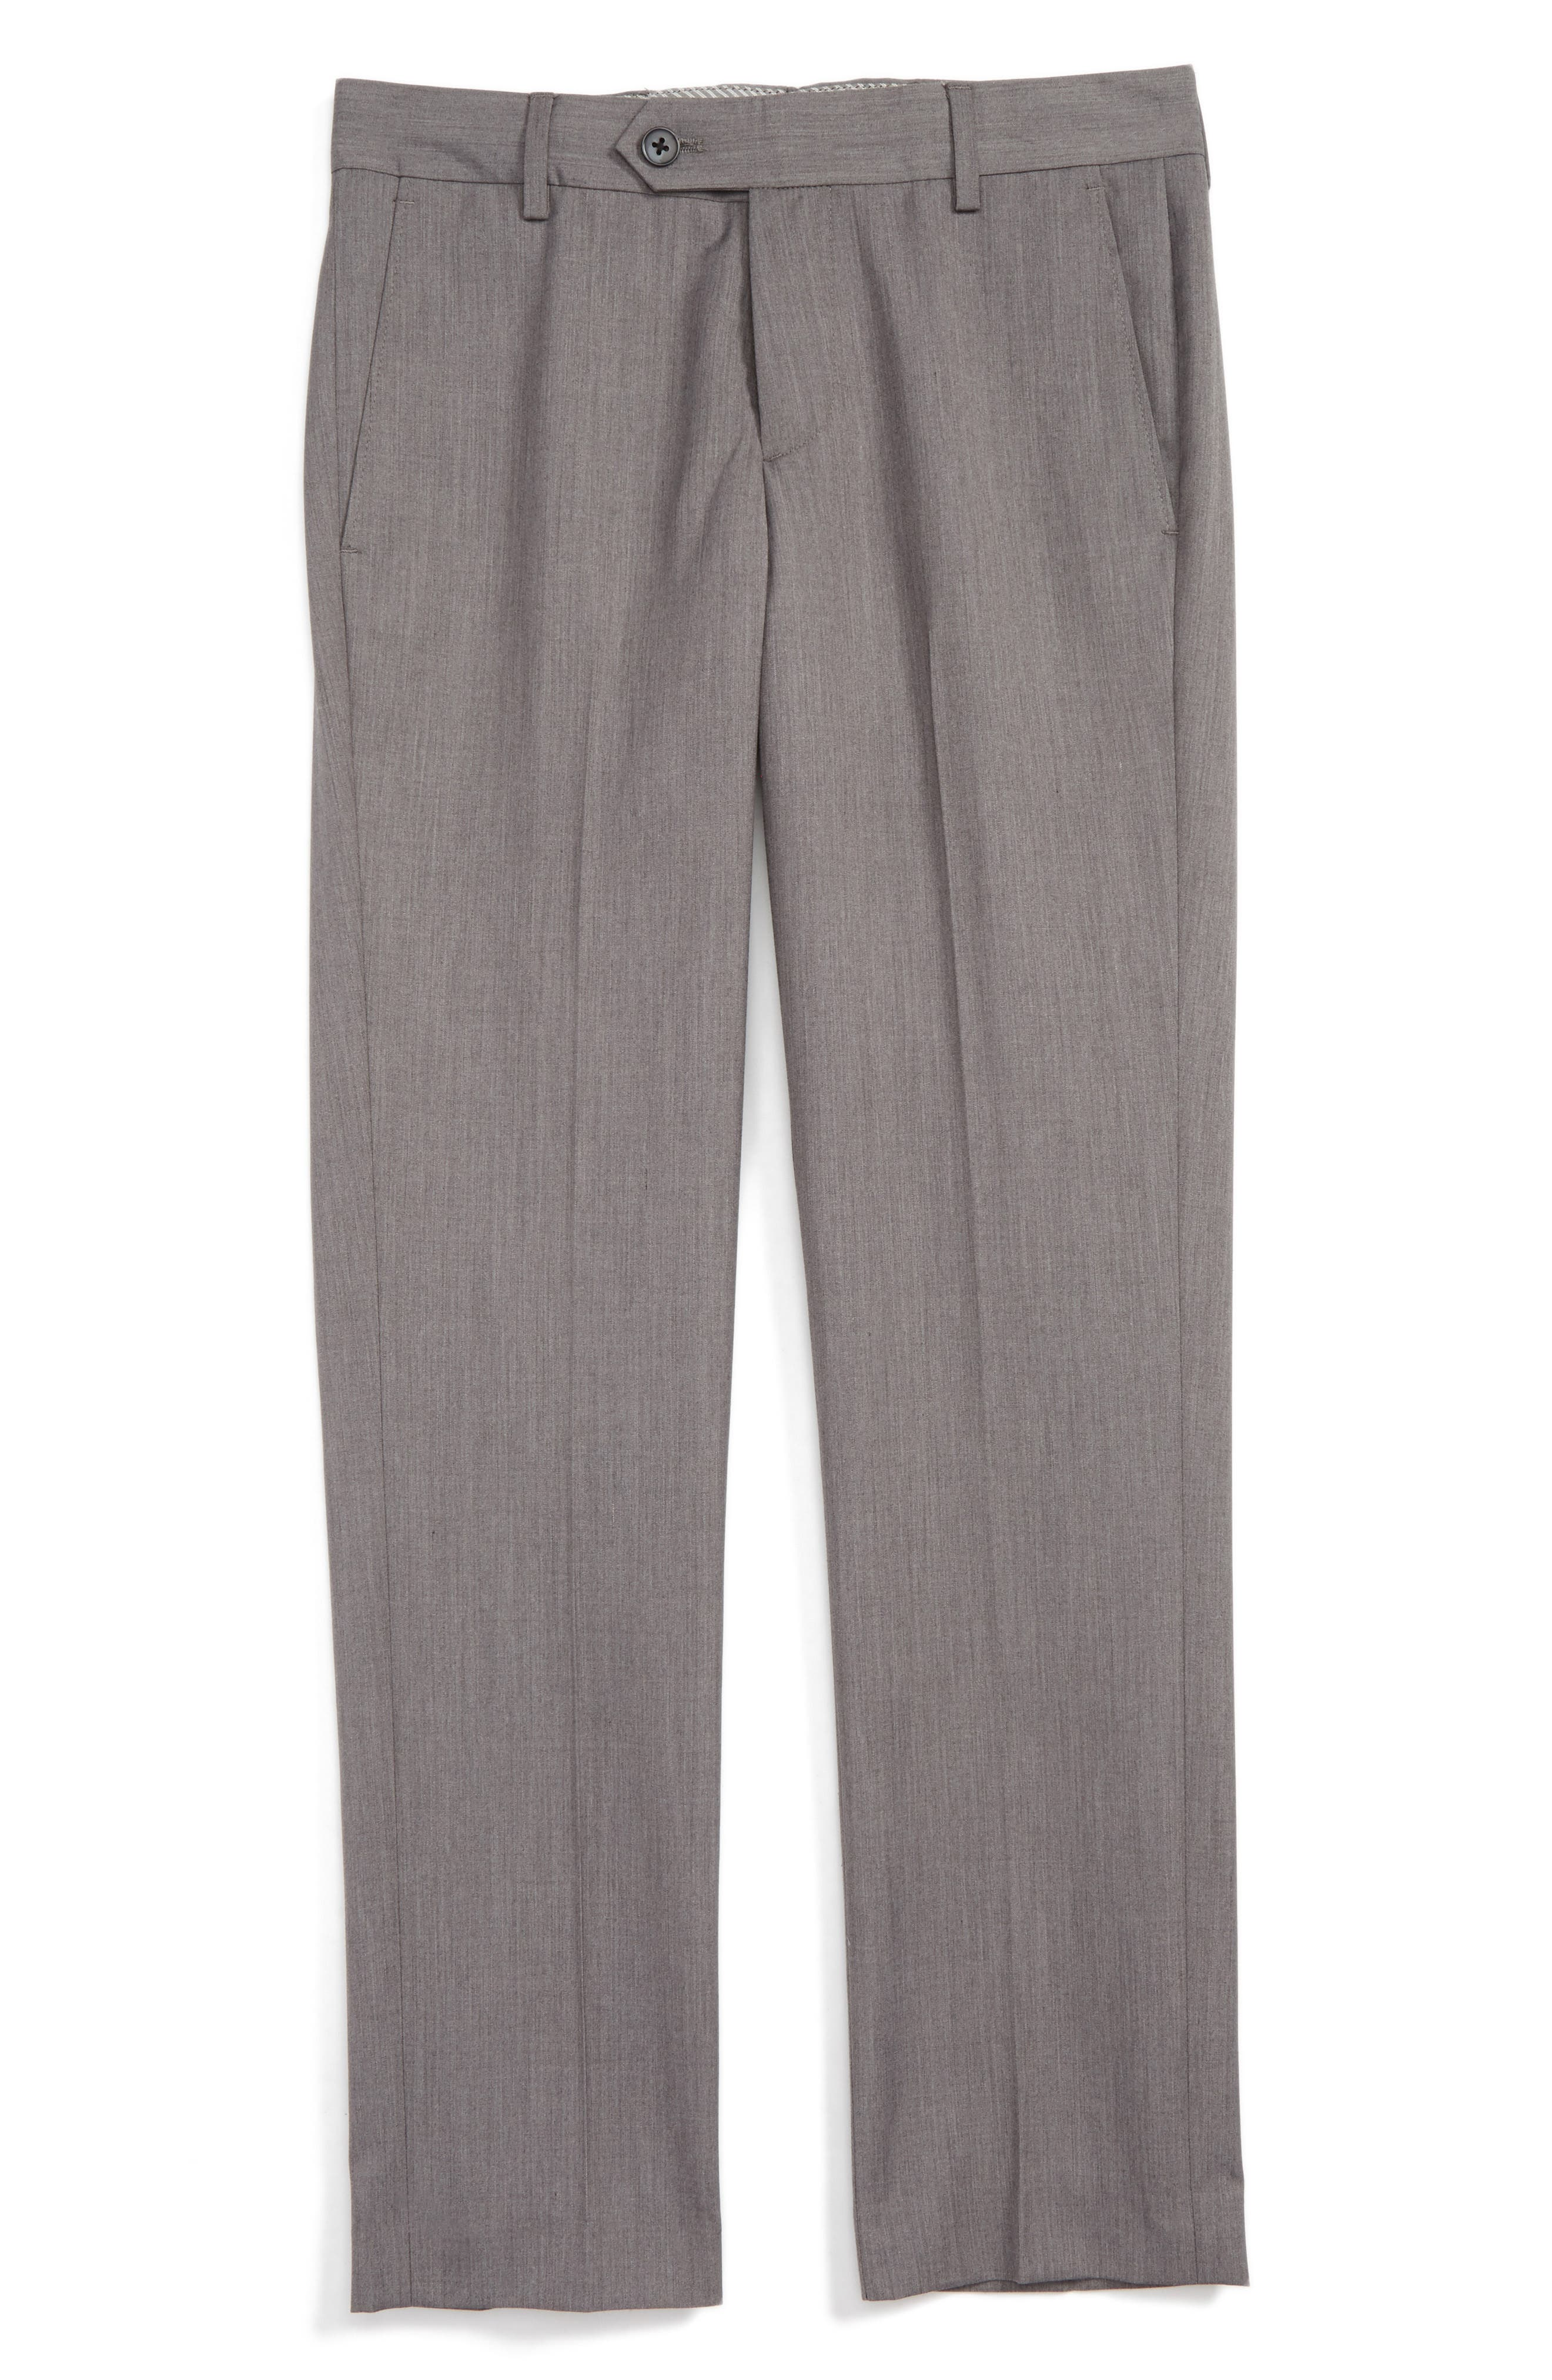 Nordstrom Elliott Slim Fit Flat Front Trousers (Toddler Boys, Little Boys & Big Boys)